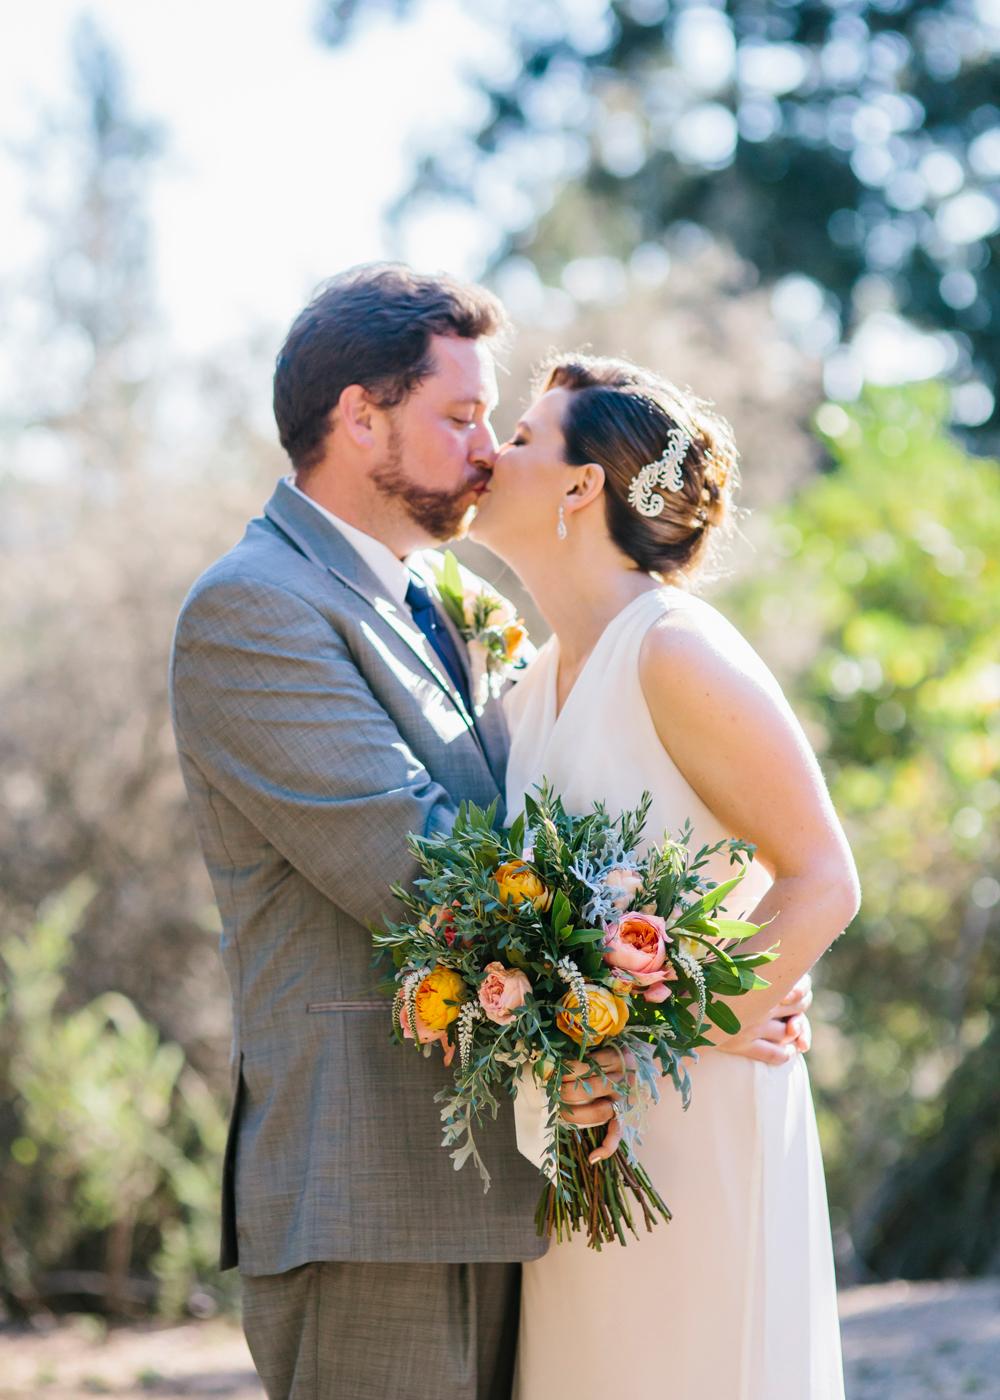 pema-osel-ling-santa-cruz-wedding-photography-lilouette-61.jpg